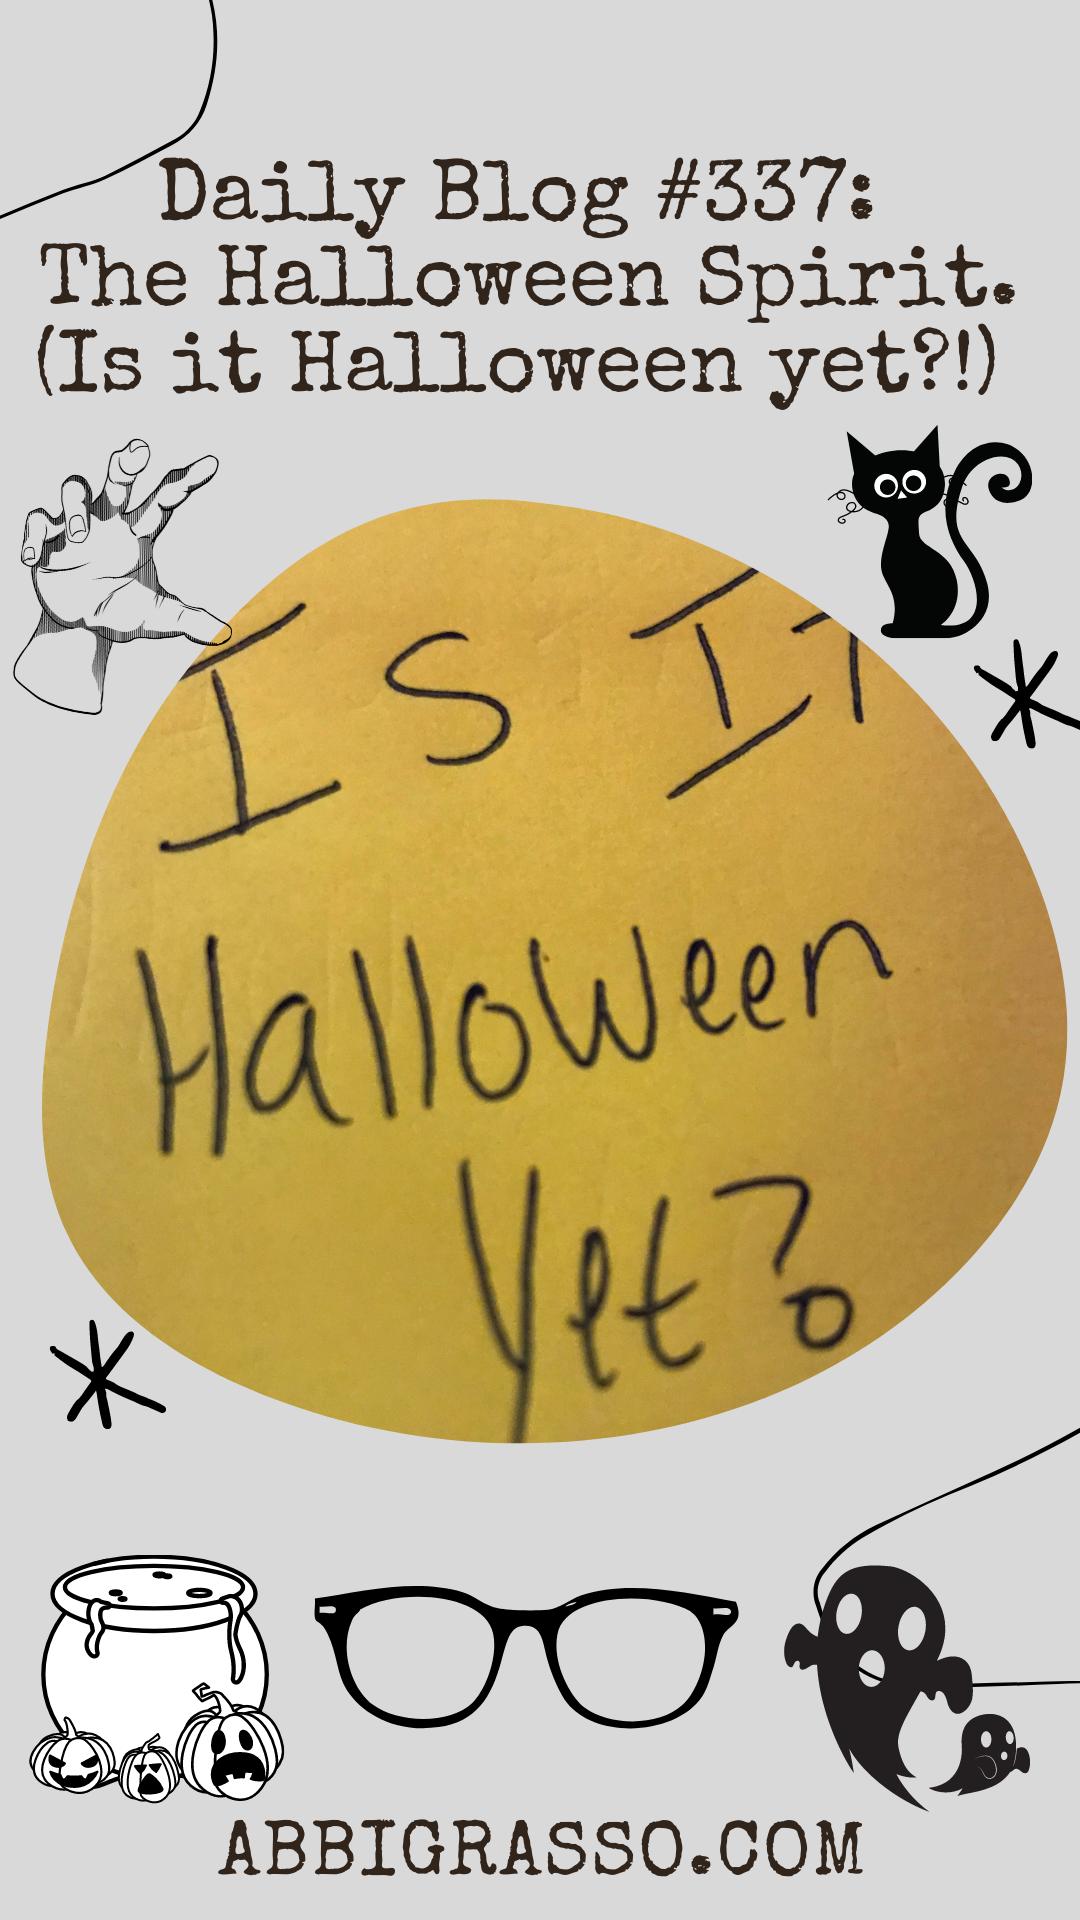 Daily Blog #337: The Halloween Spirit. (Is it Halloween yet?!)